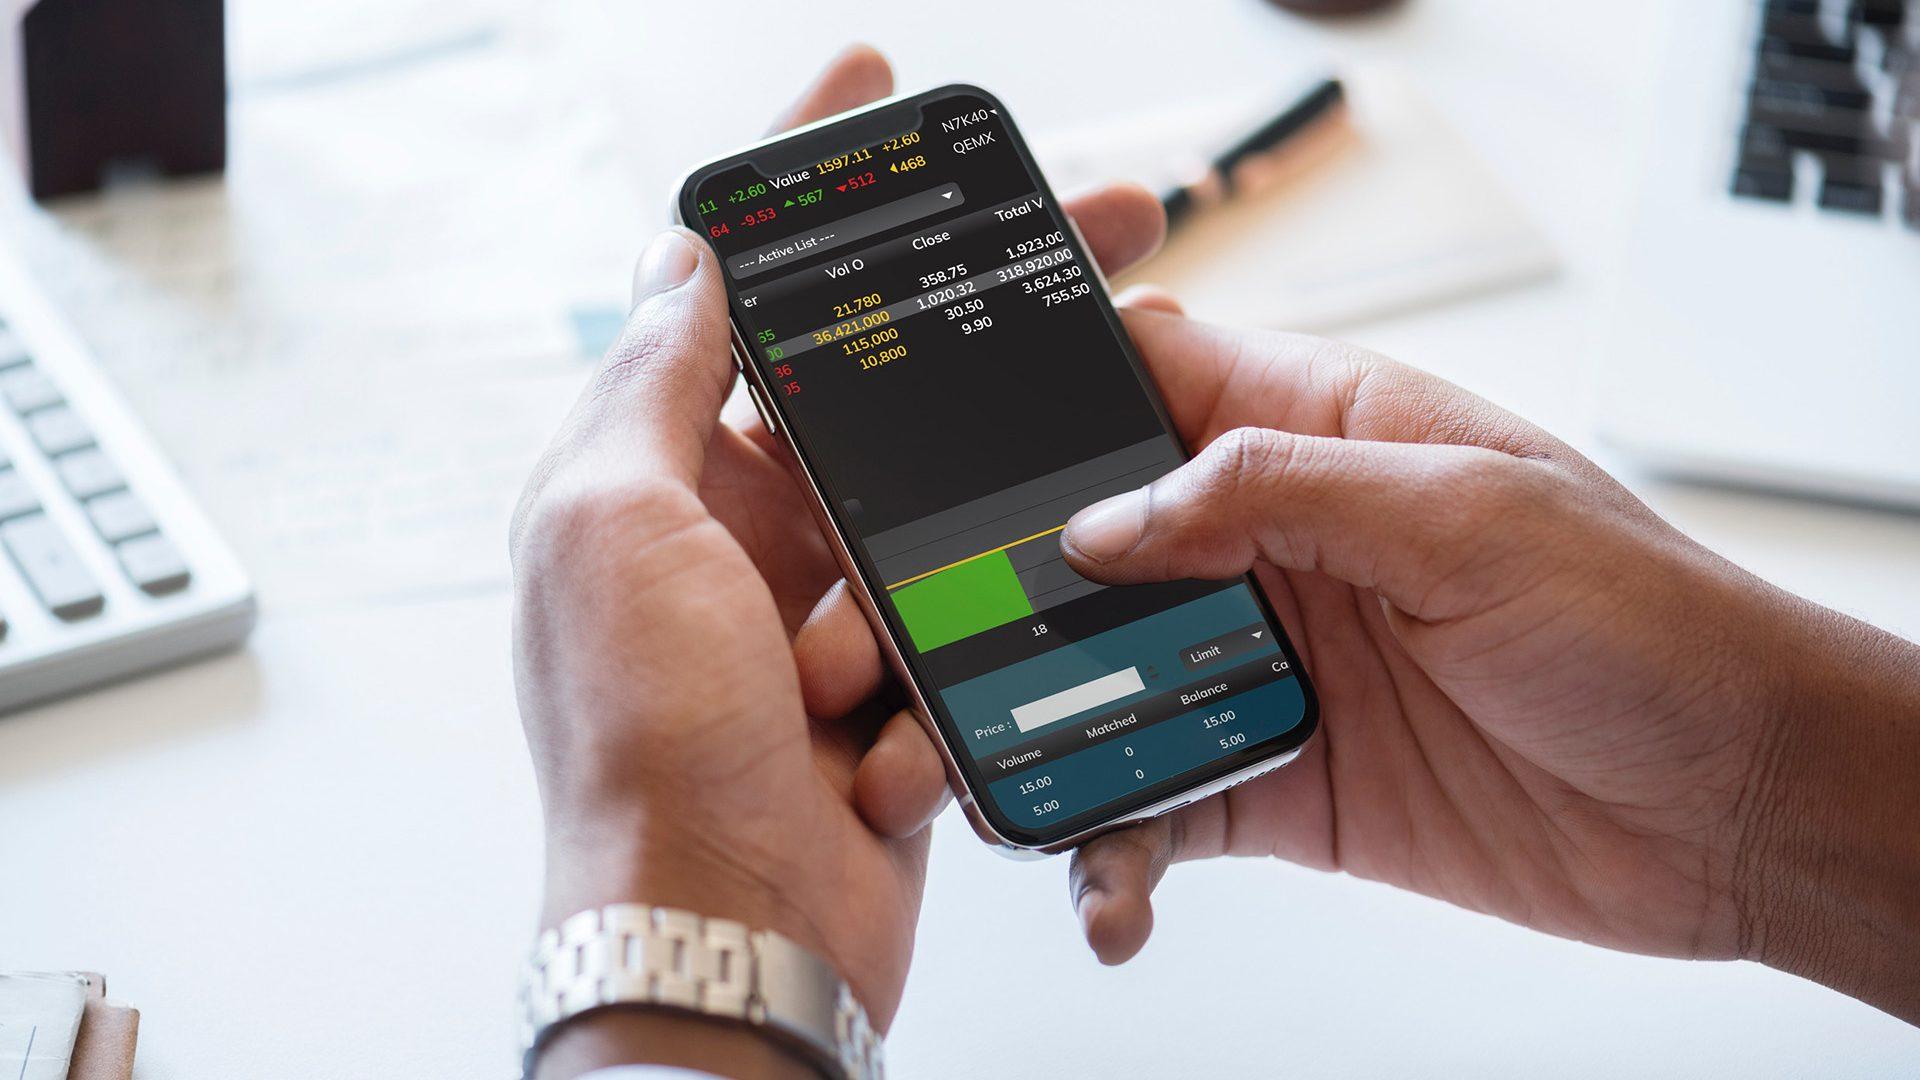 3 Reasons Bitcoin Has Rallied Above $700